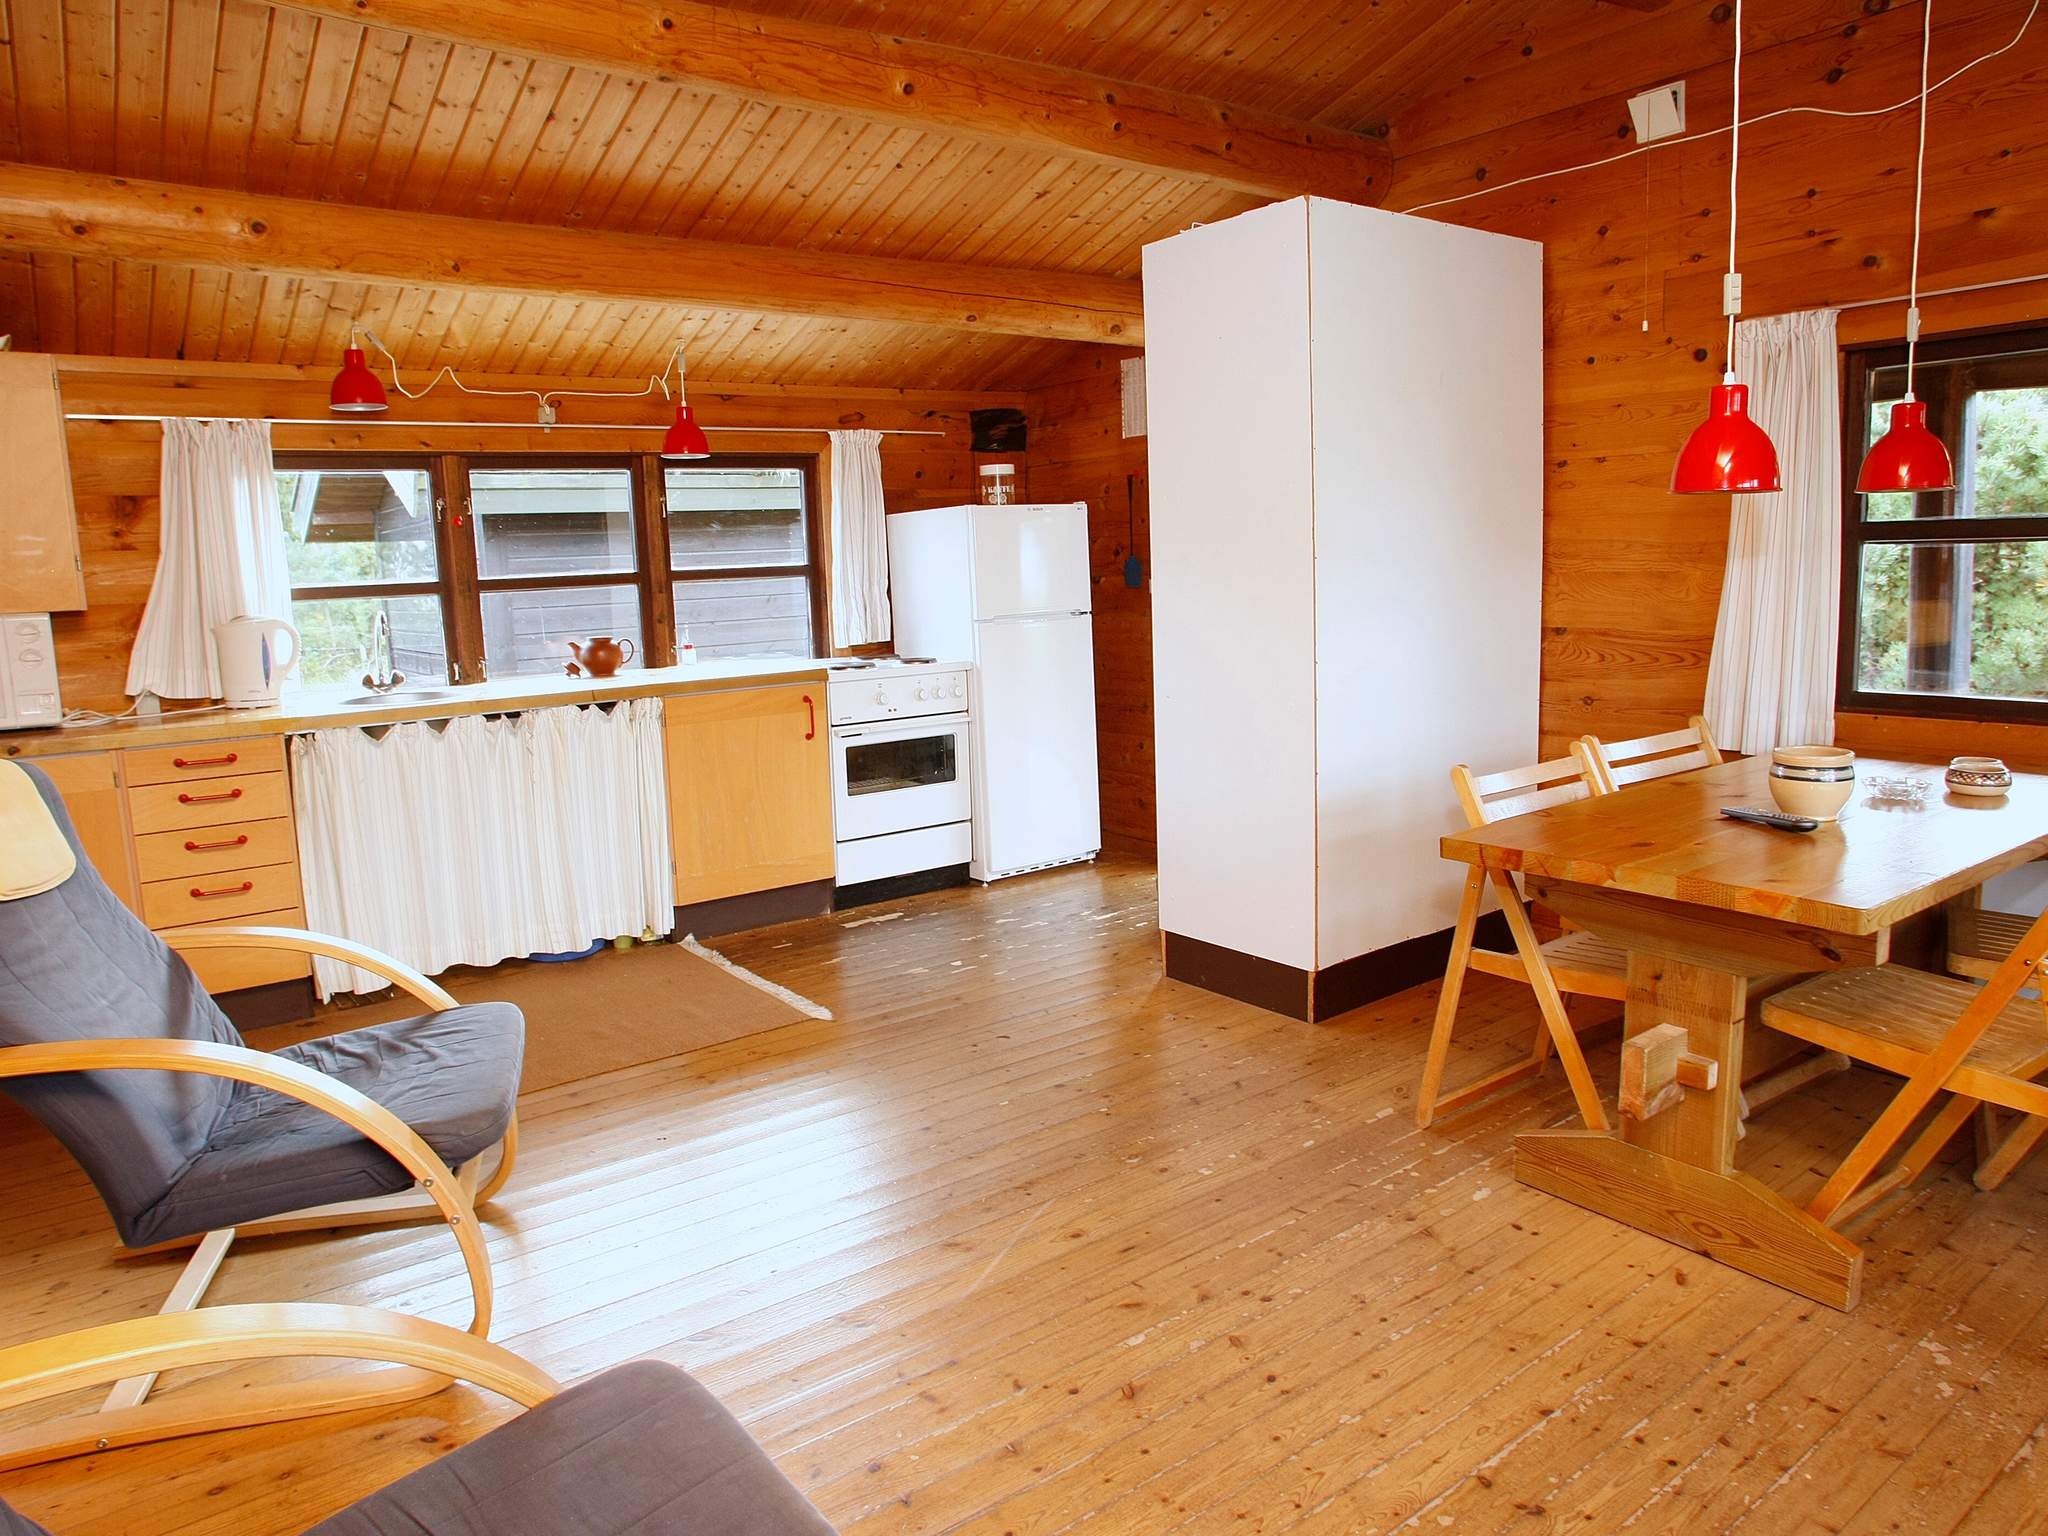 Ferienhaus Læsø/Vesterø (88197), Læsø, , Læsø, Dänemark, Bild 4